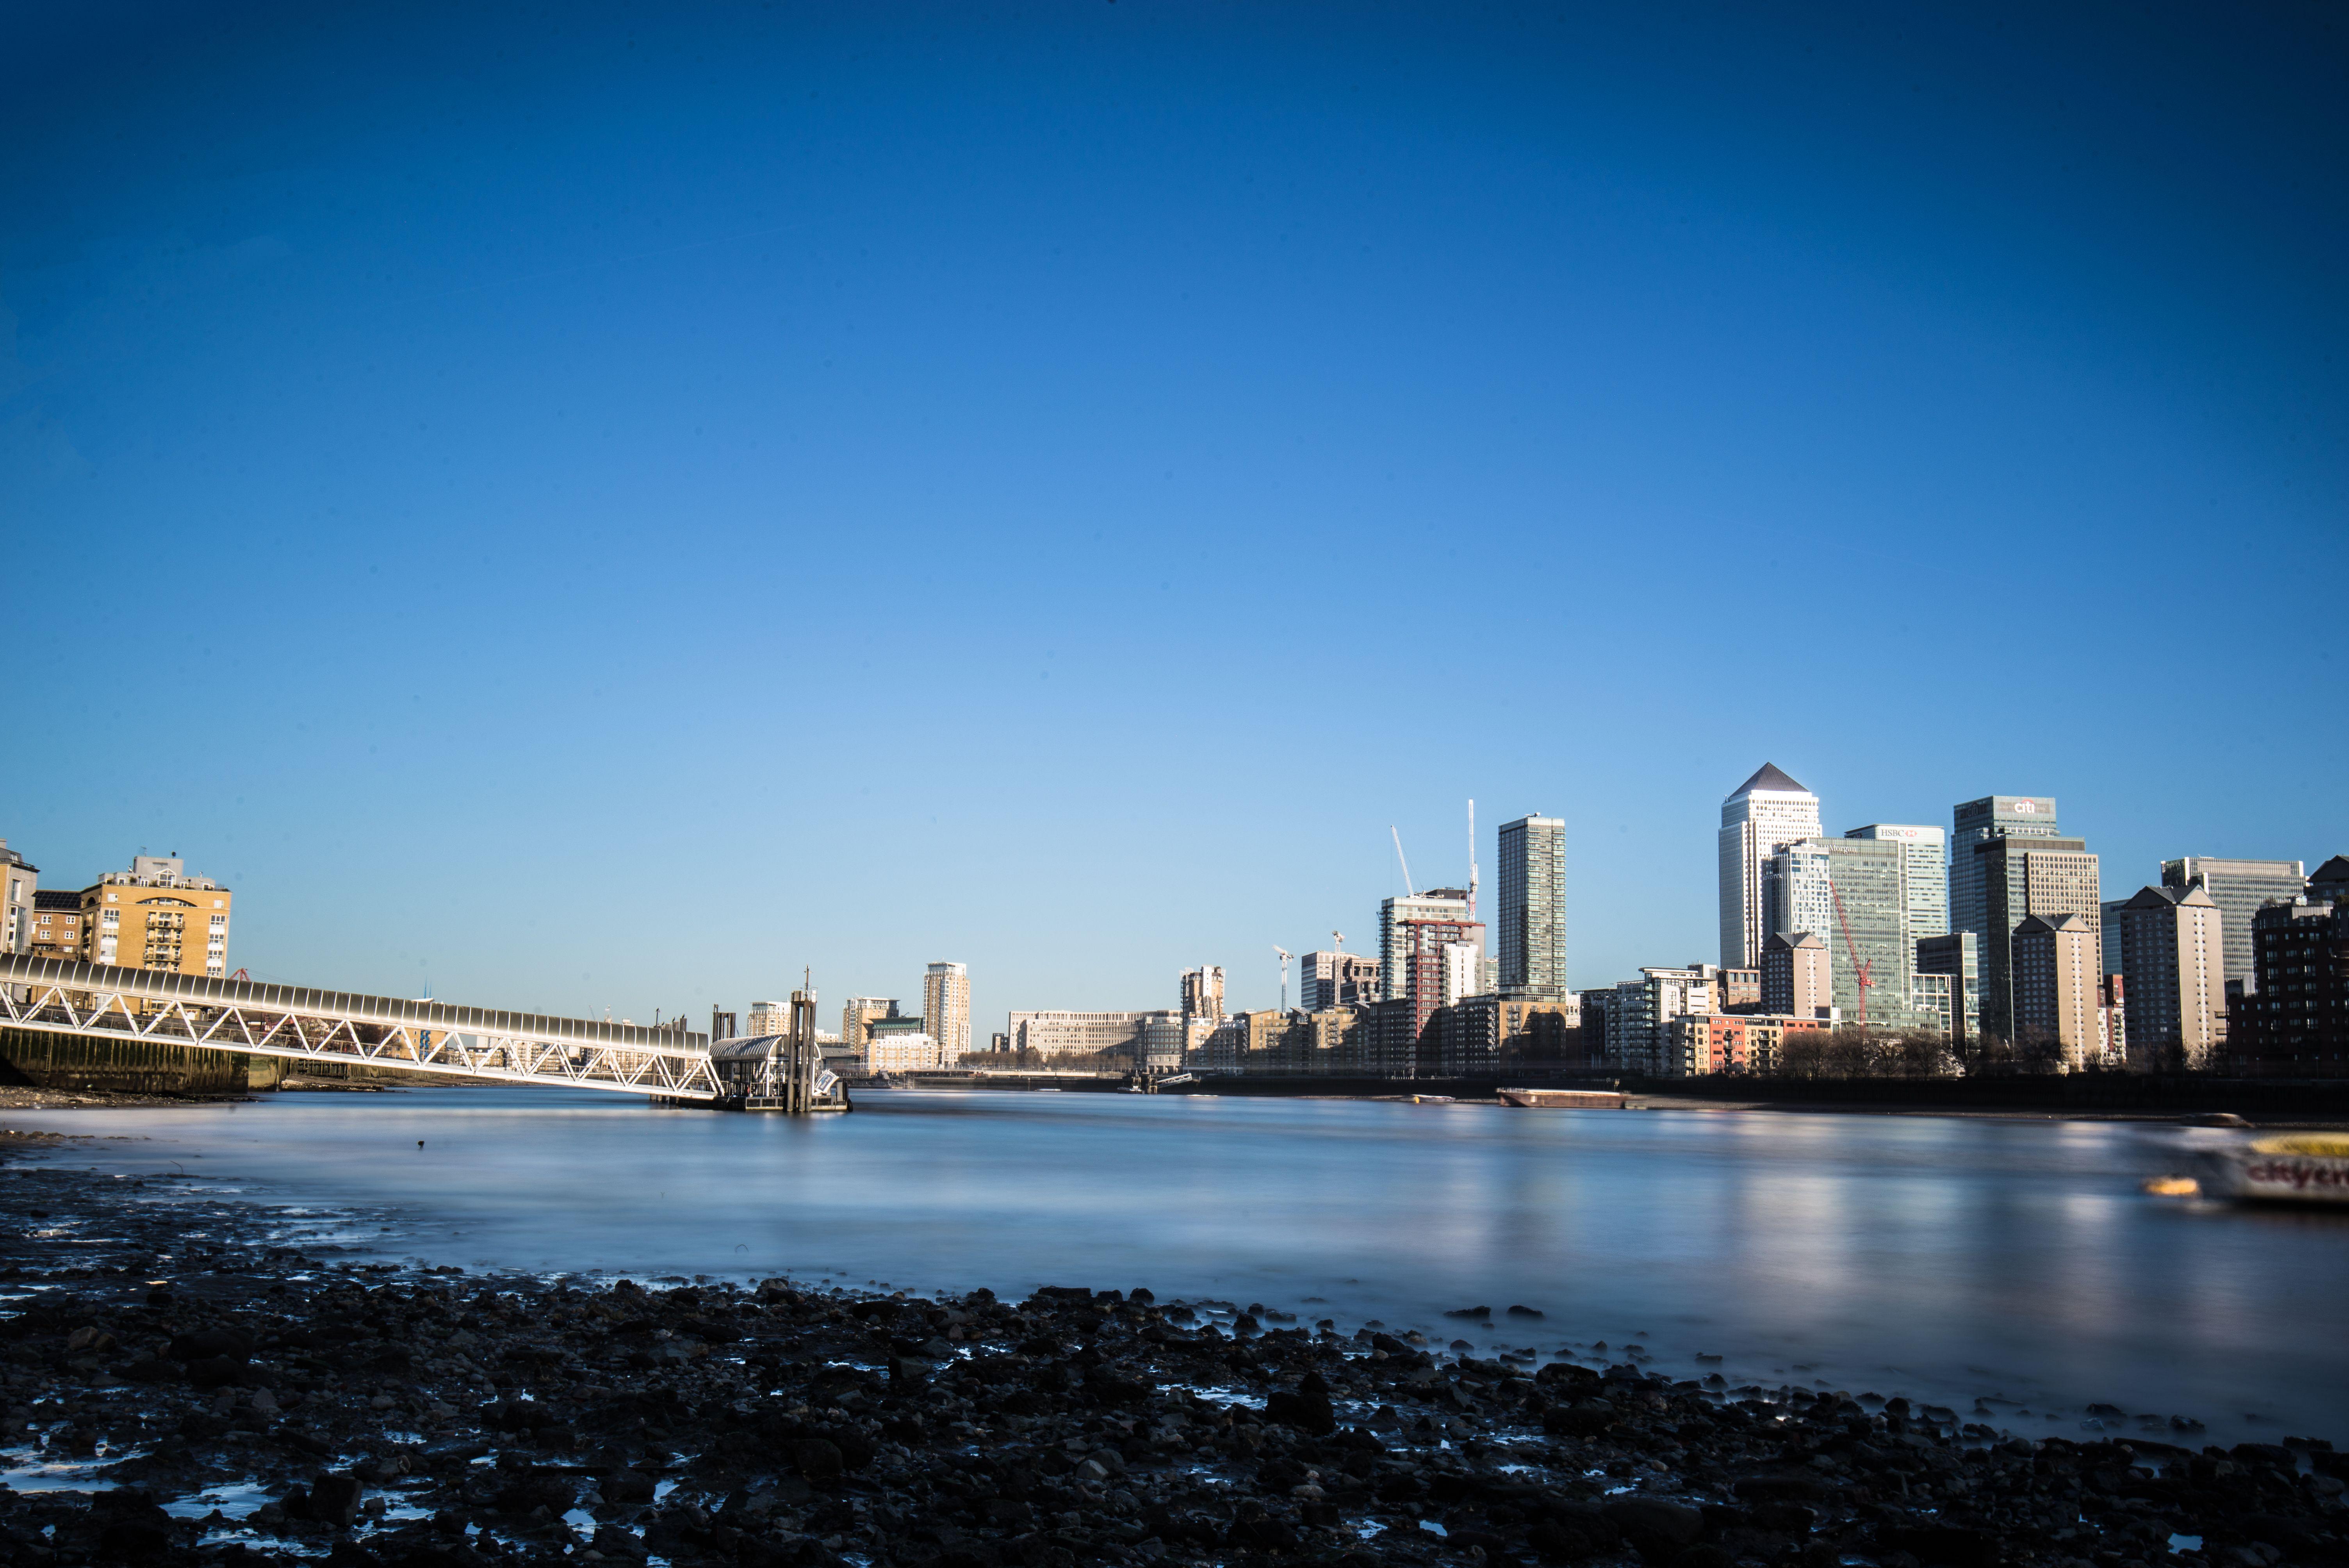 Photos - London Photographic (London, England) | Meetup